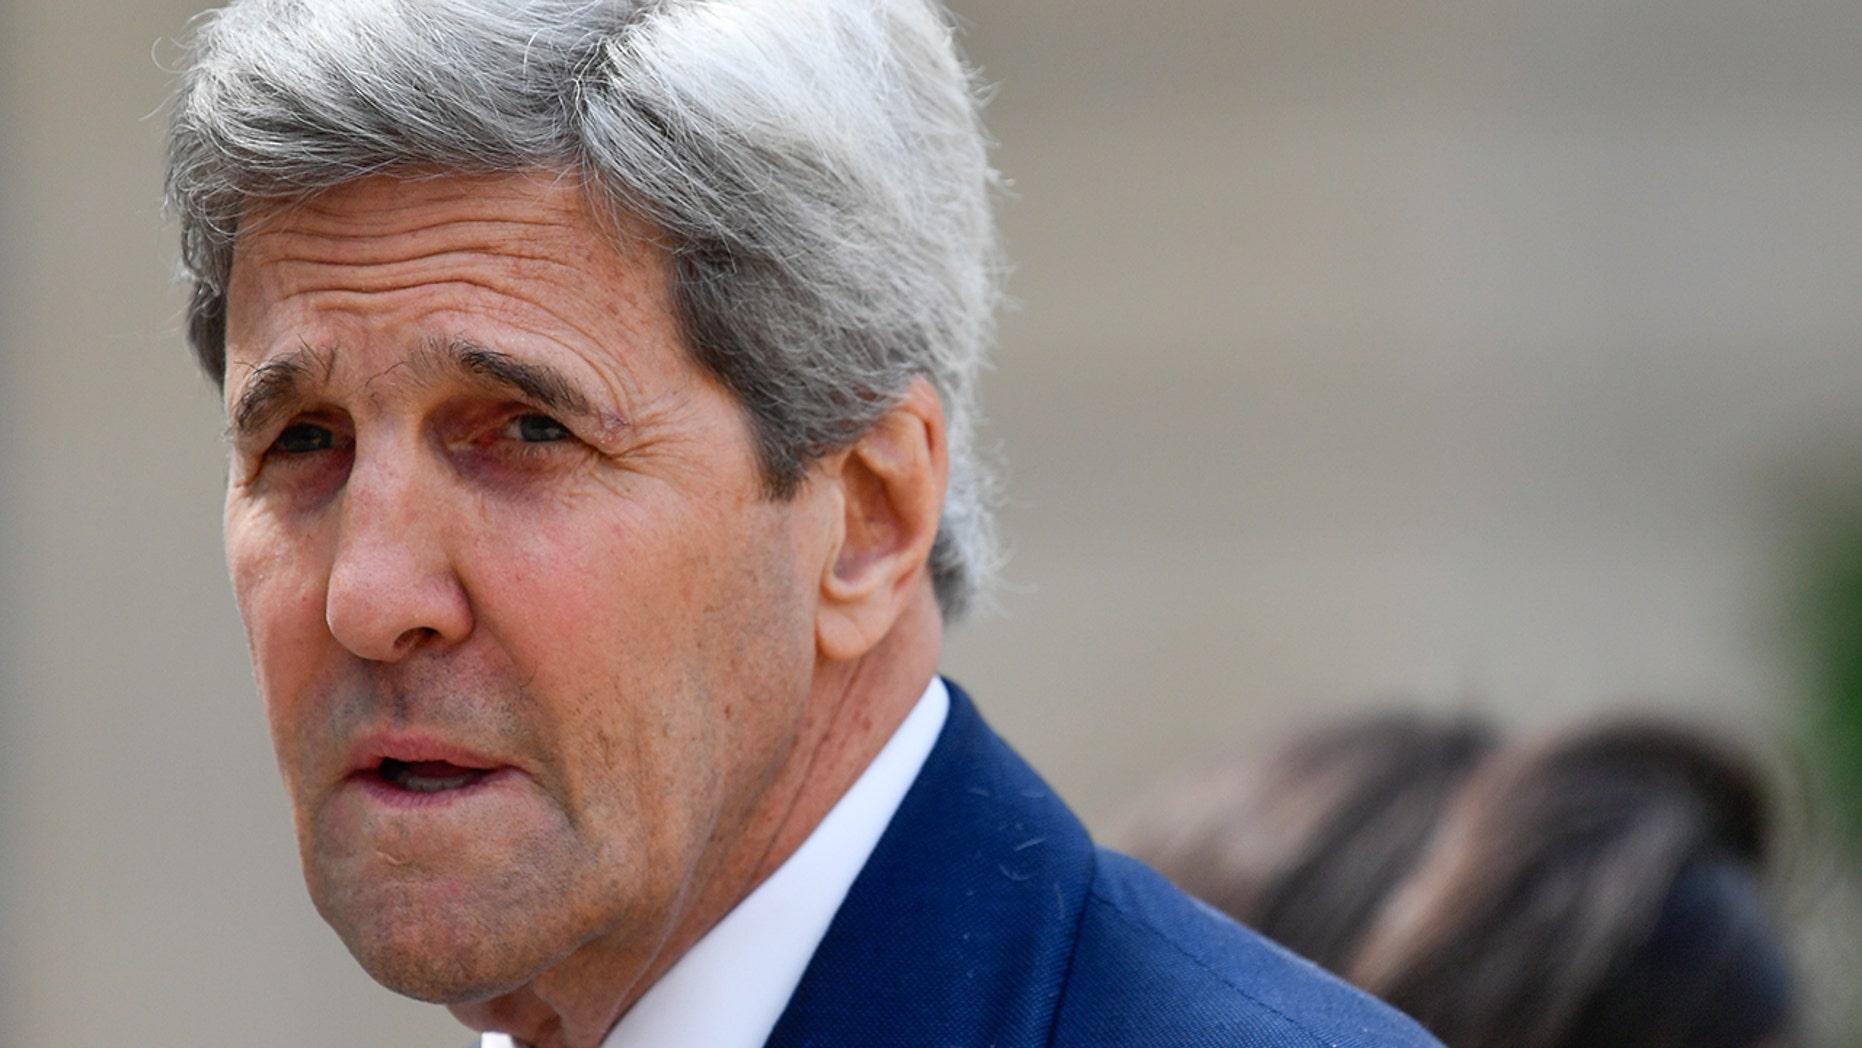 FILE 2018: Former Secretary of State John Kerry in Paris (Photo by Julien Mattia/NurPhoto via Getty Images)